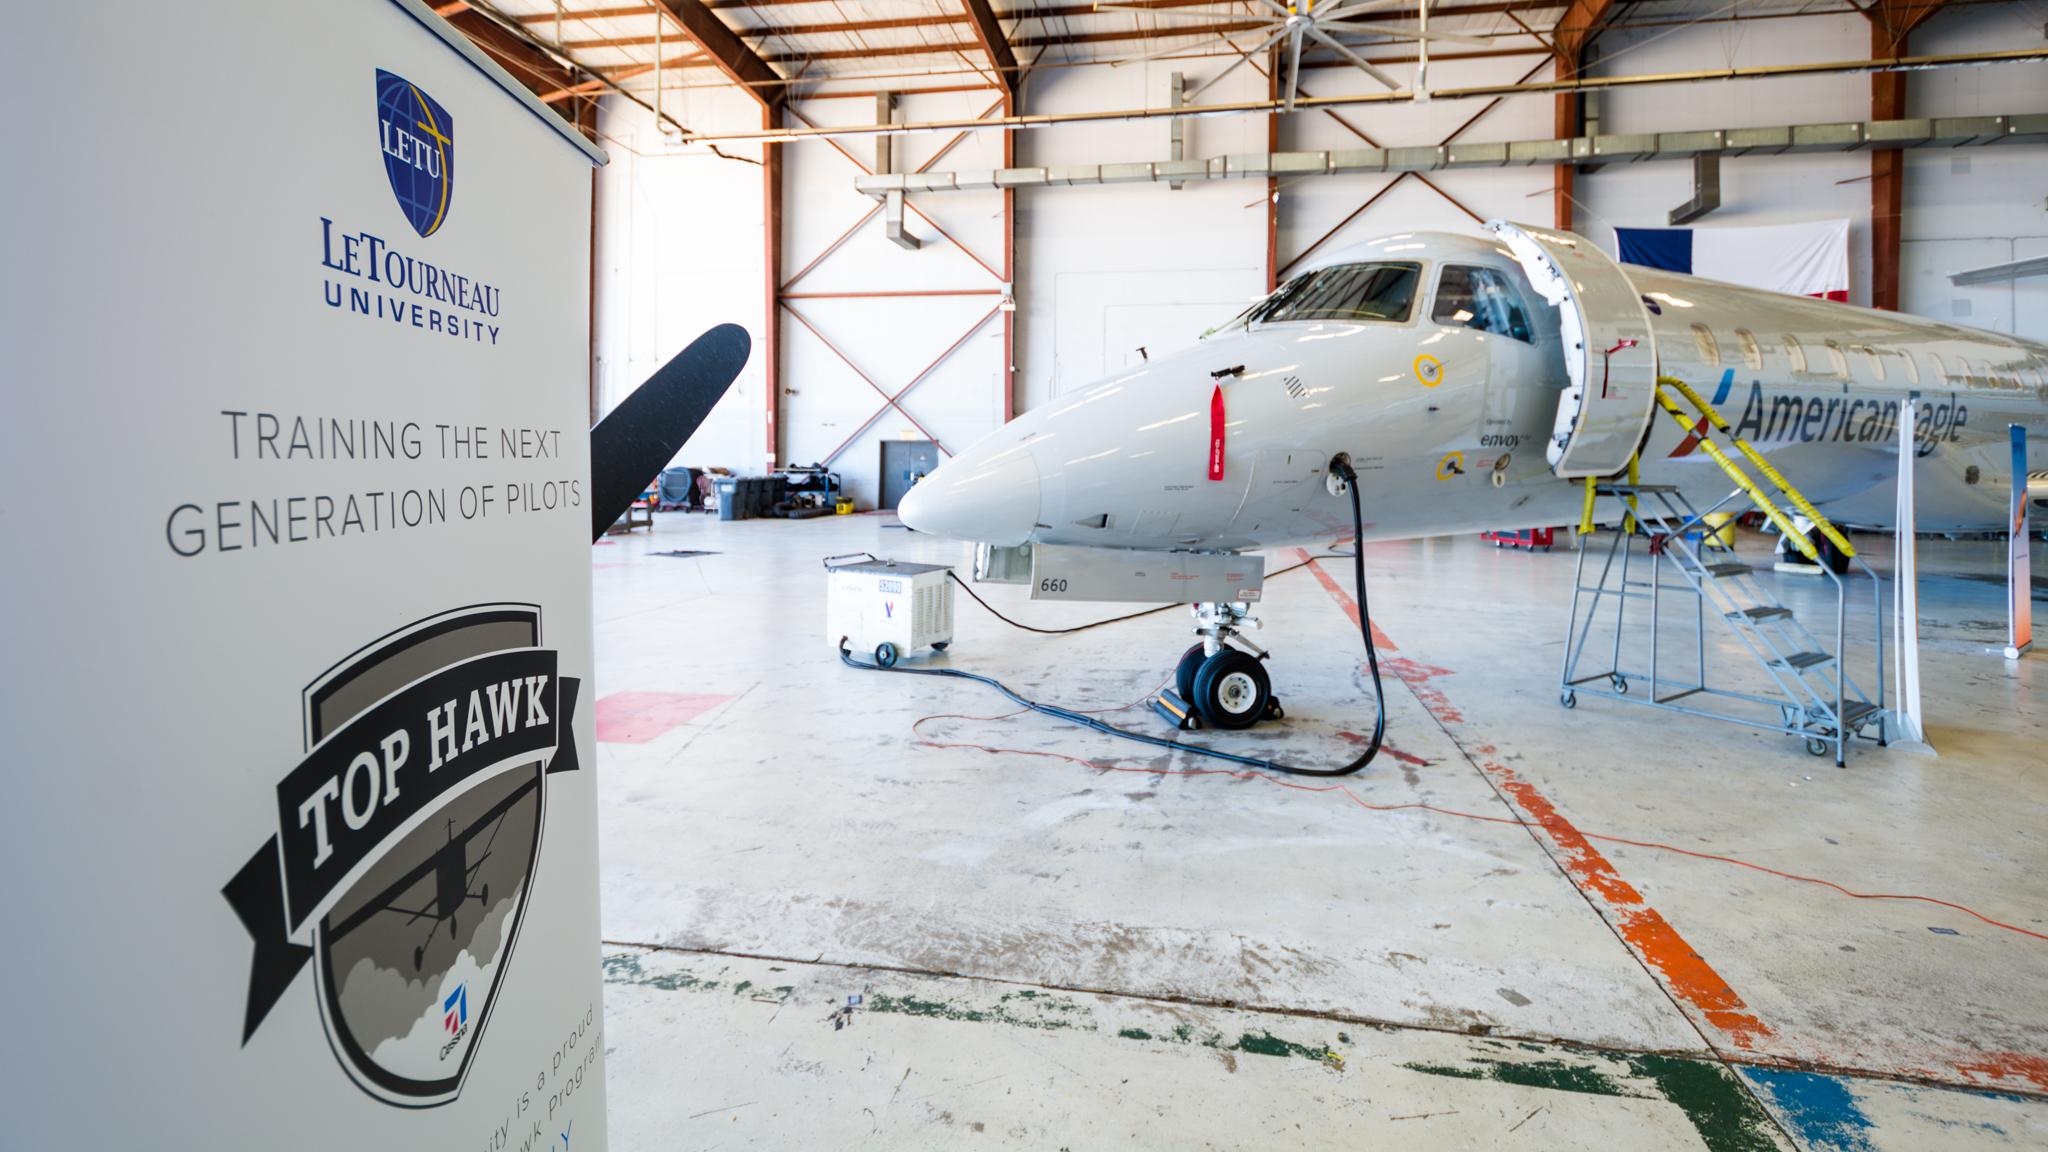 Letourneau University Fall 2016 Career Fair Envoy Air